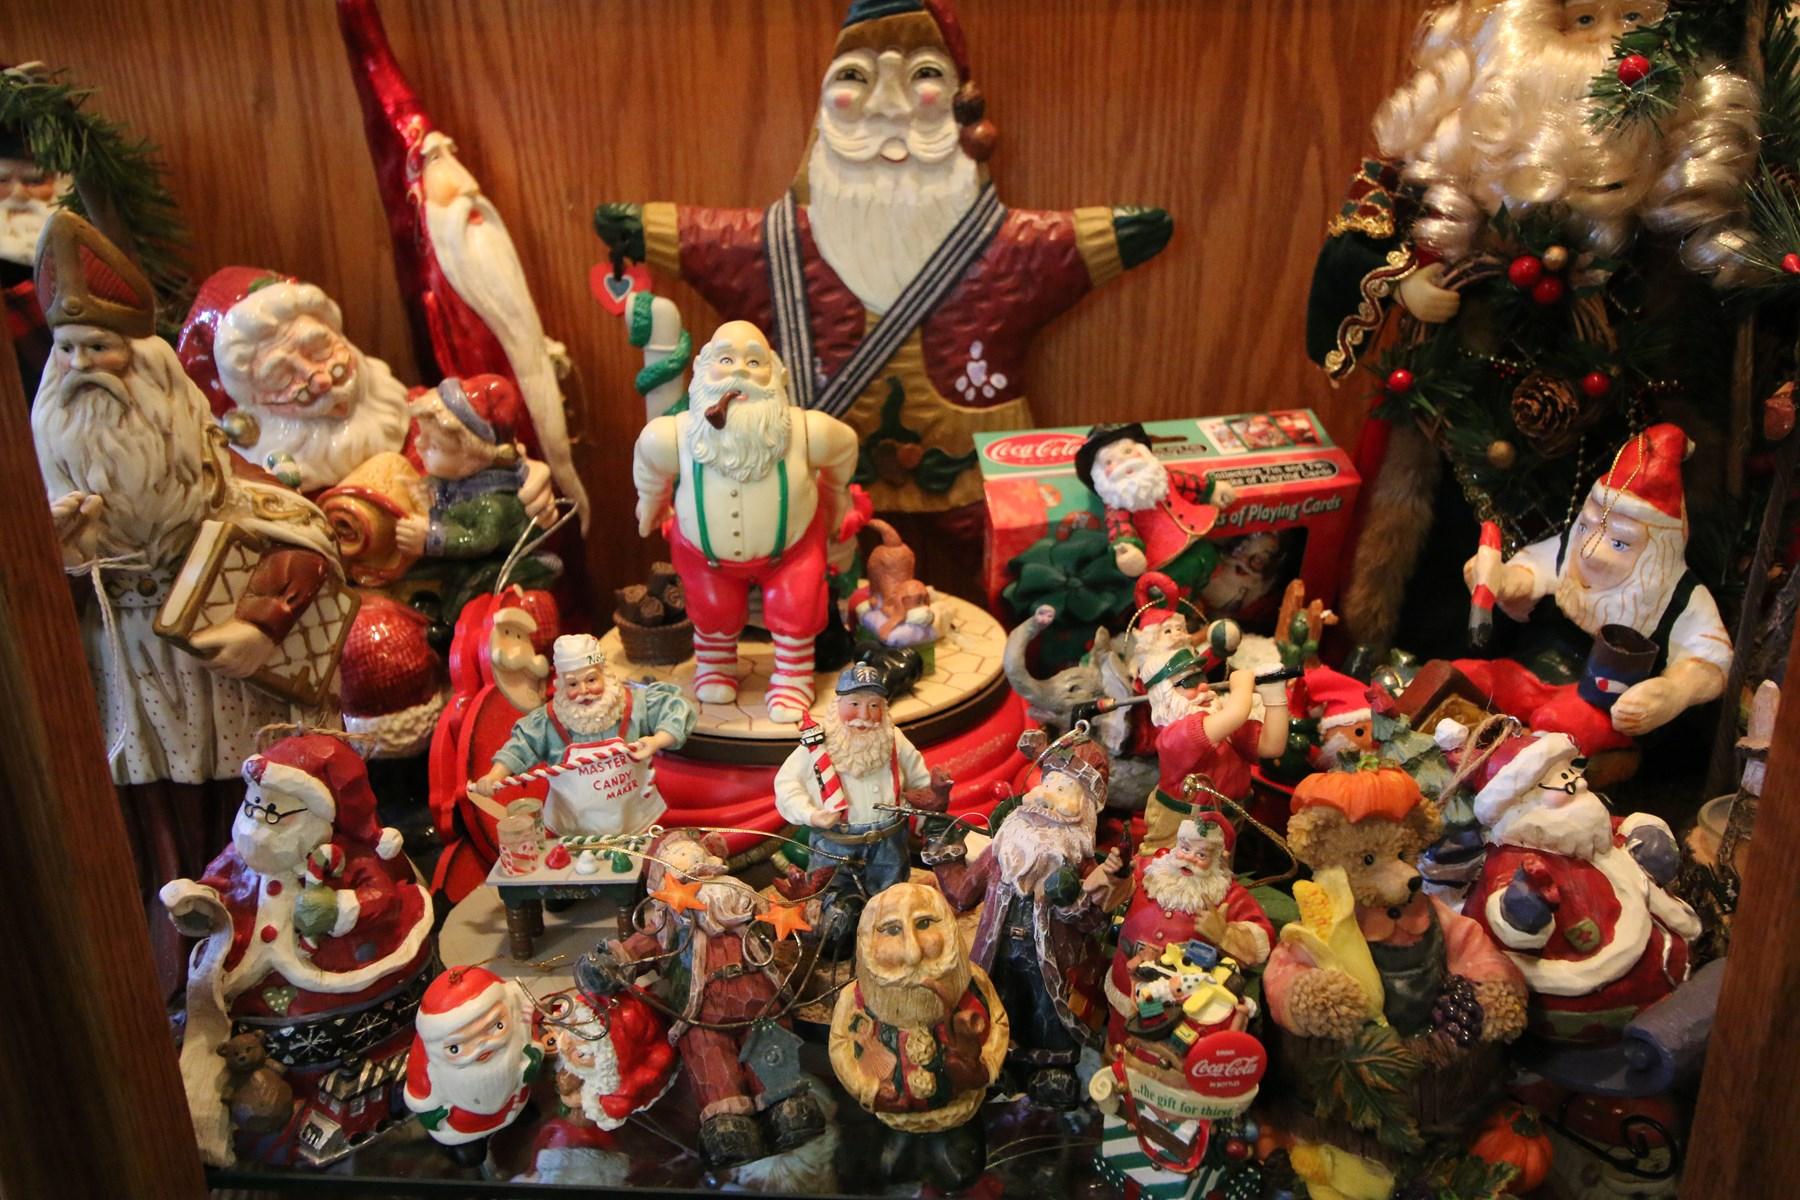 Santas, Santas, and more Santas